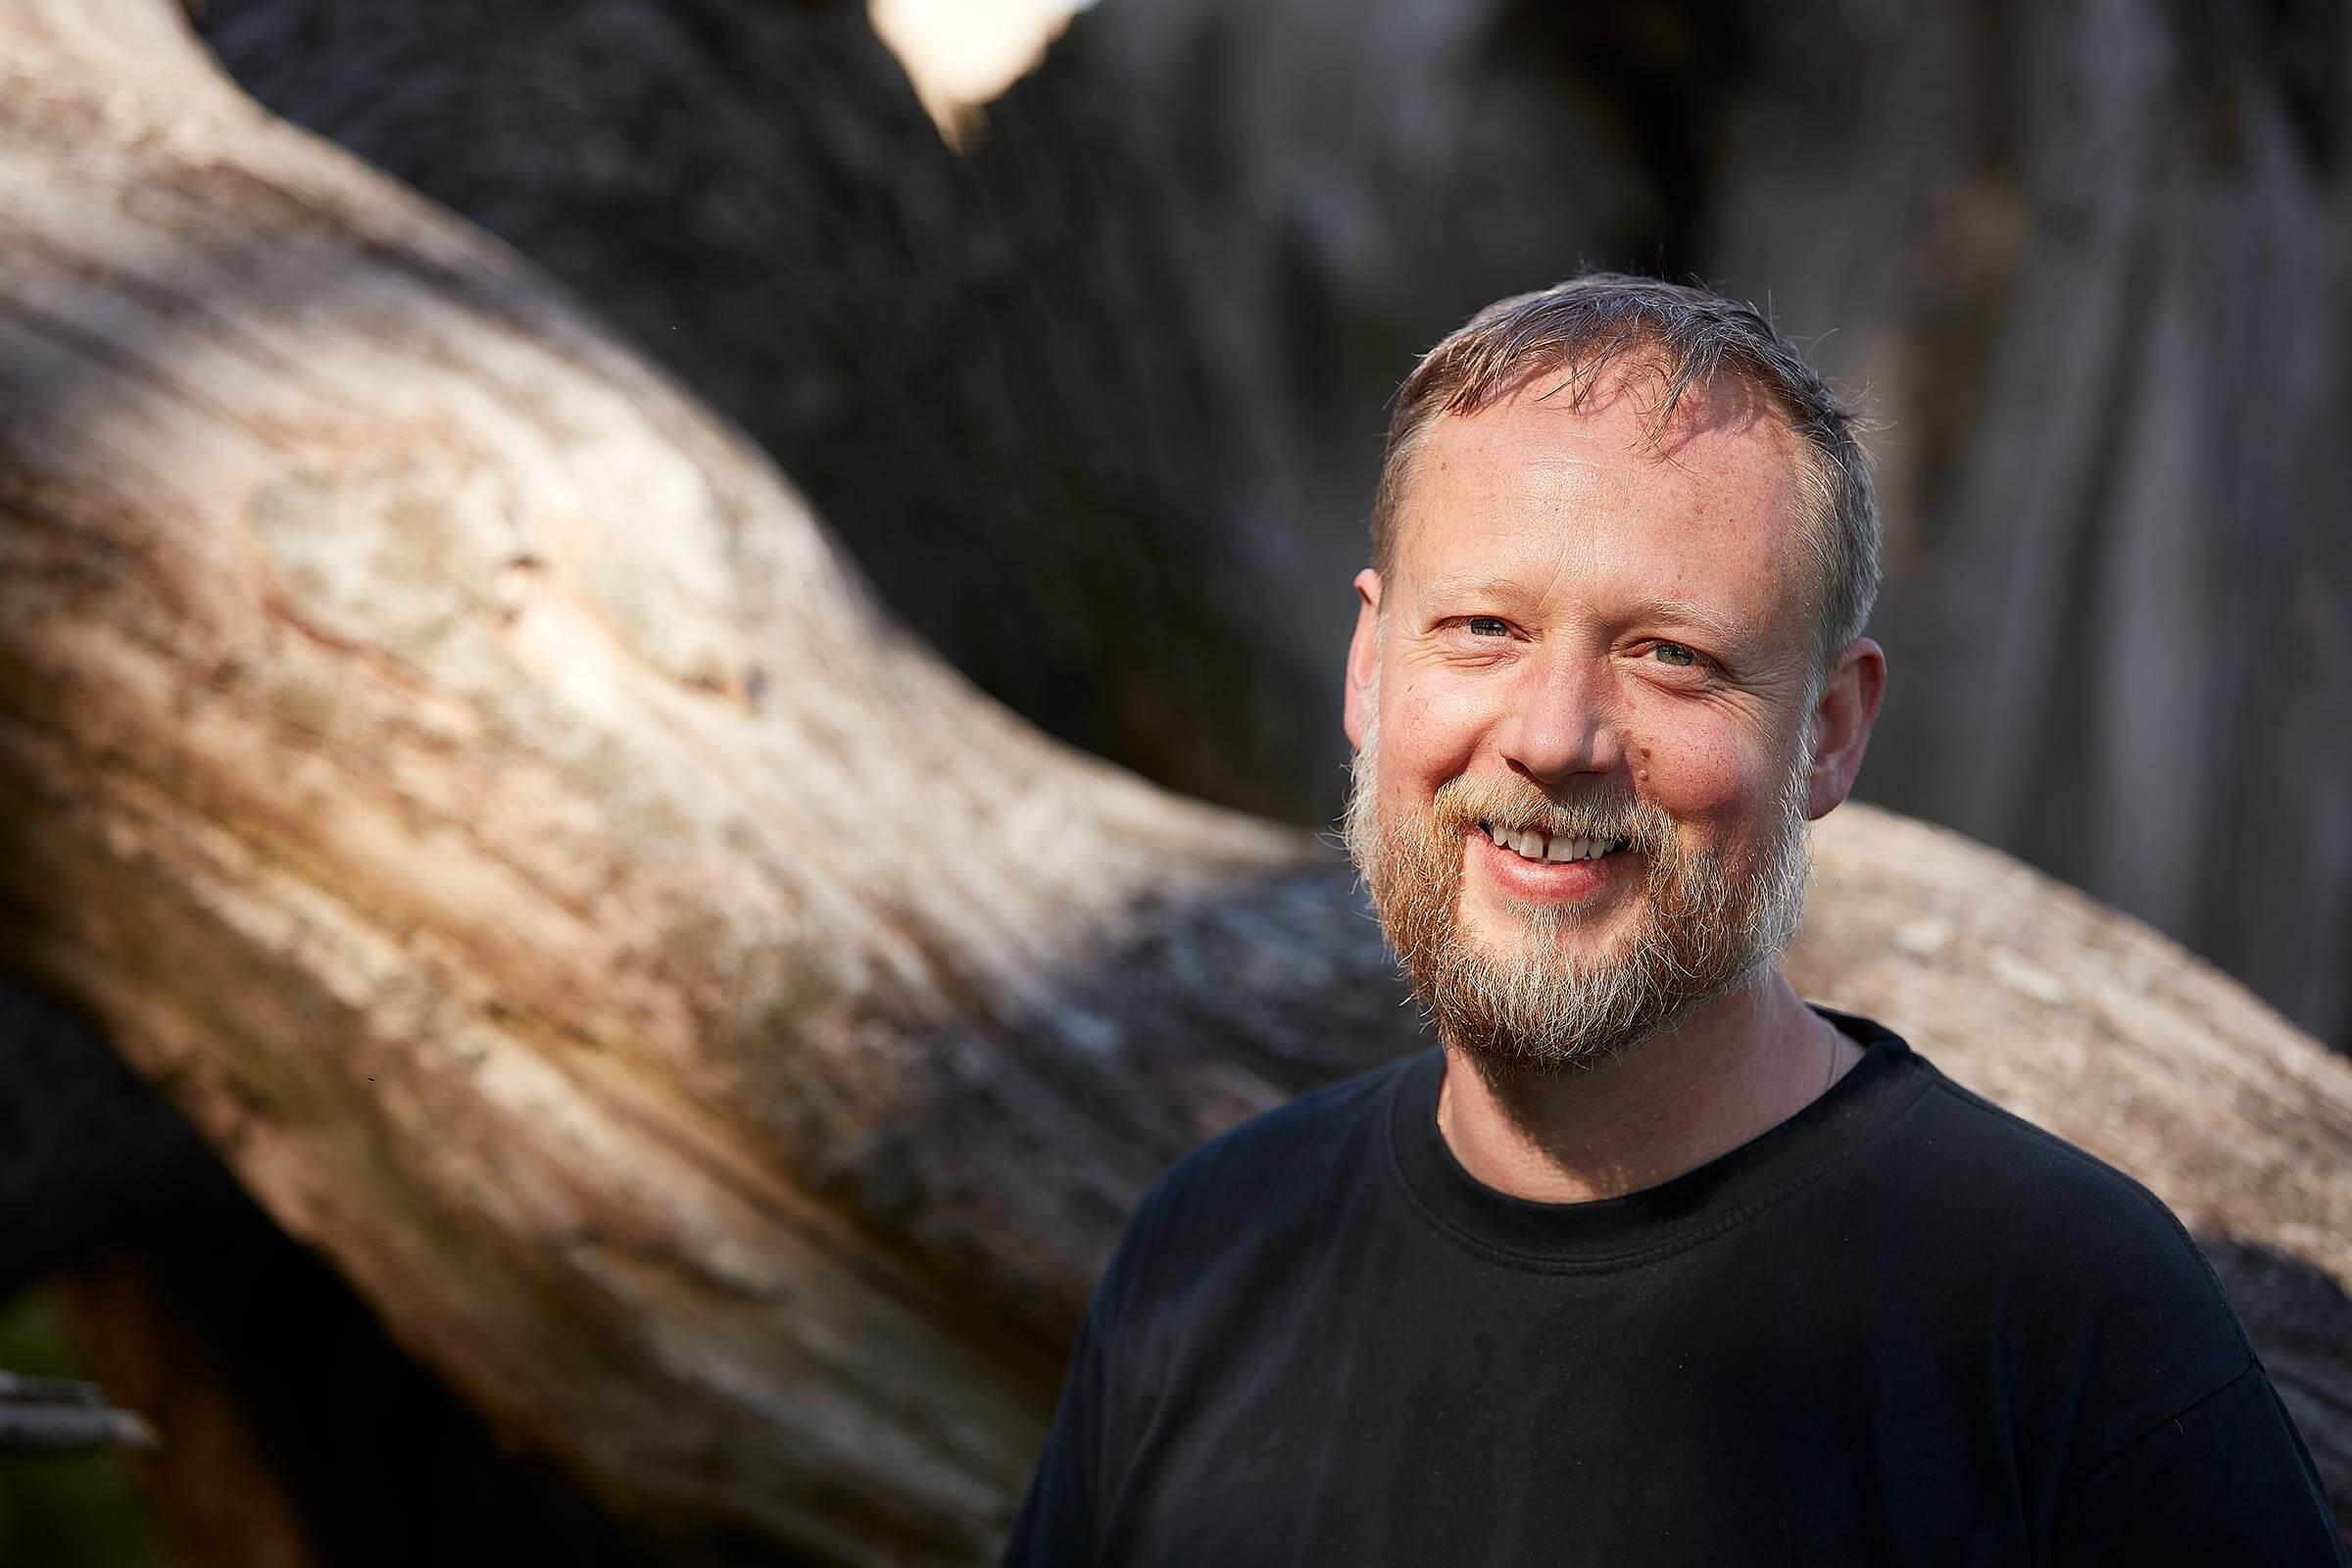 Claus Lind stukkatør interiør designer eksteriør designer stukloft kunstner